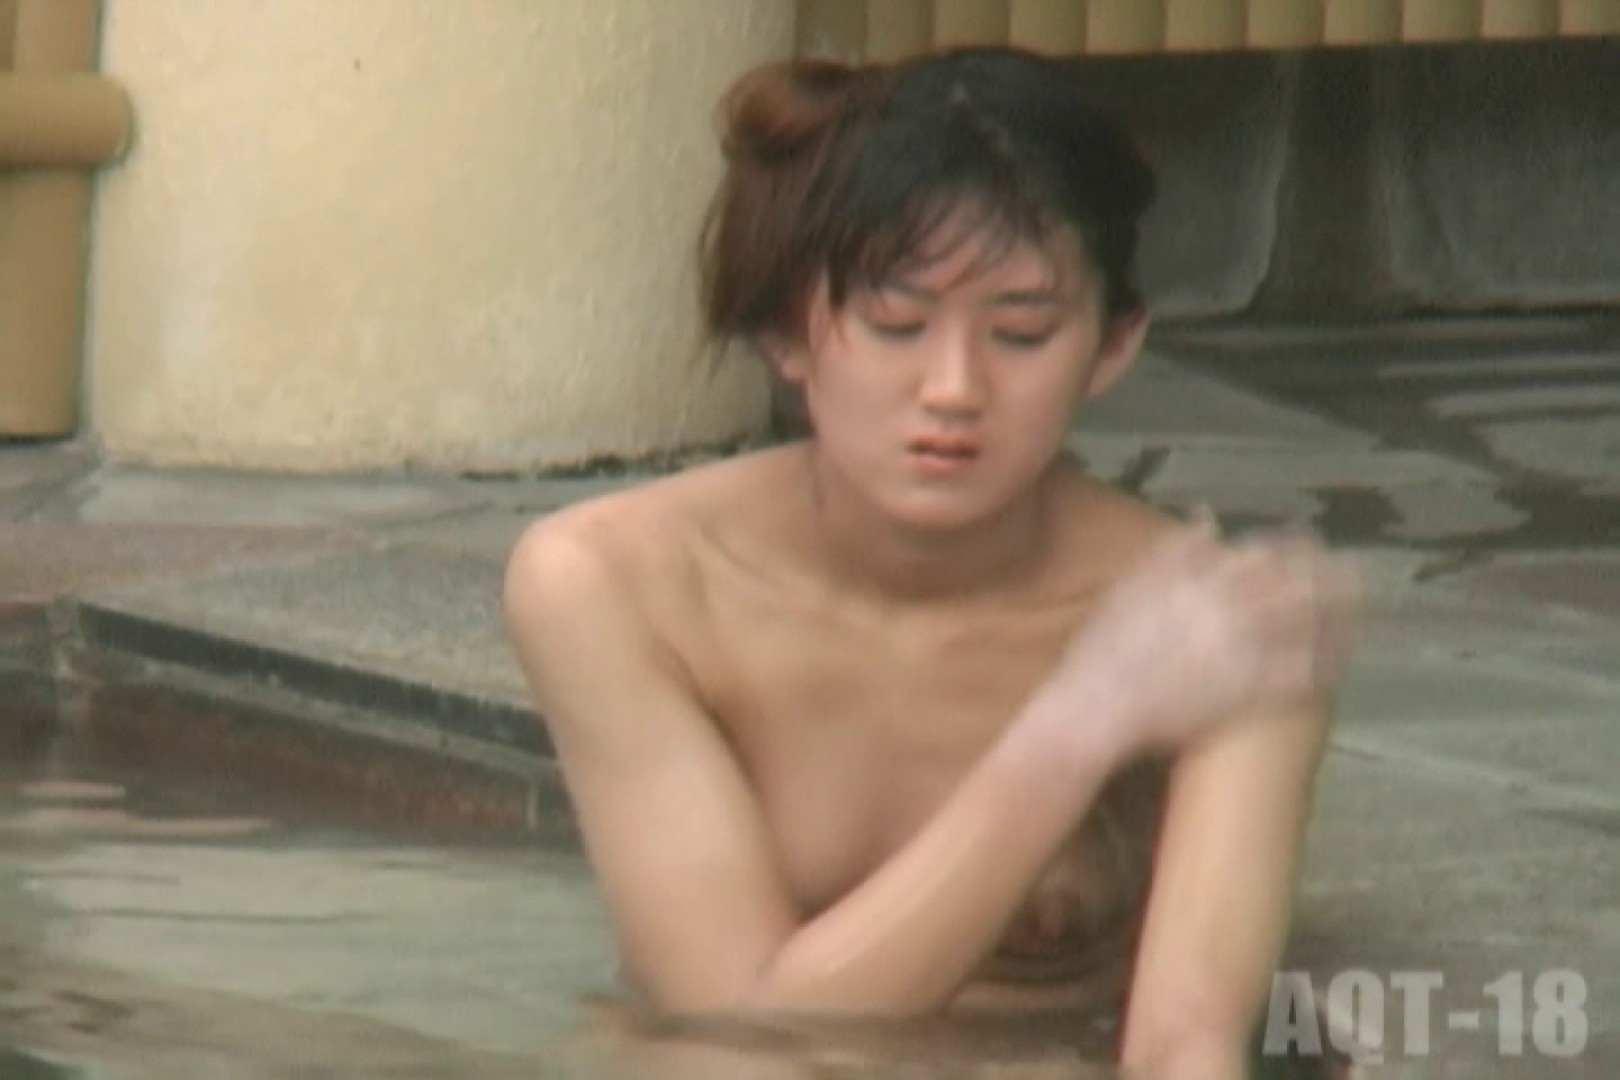 Aquaな露天風呂Vol.862 美しいOLの裸体 戯れ無修正画像 99pic 20